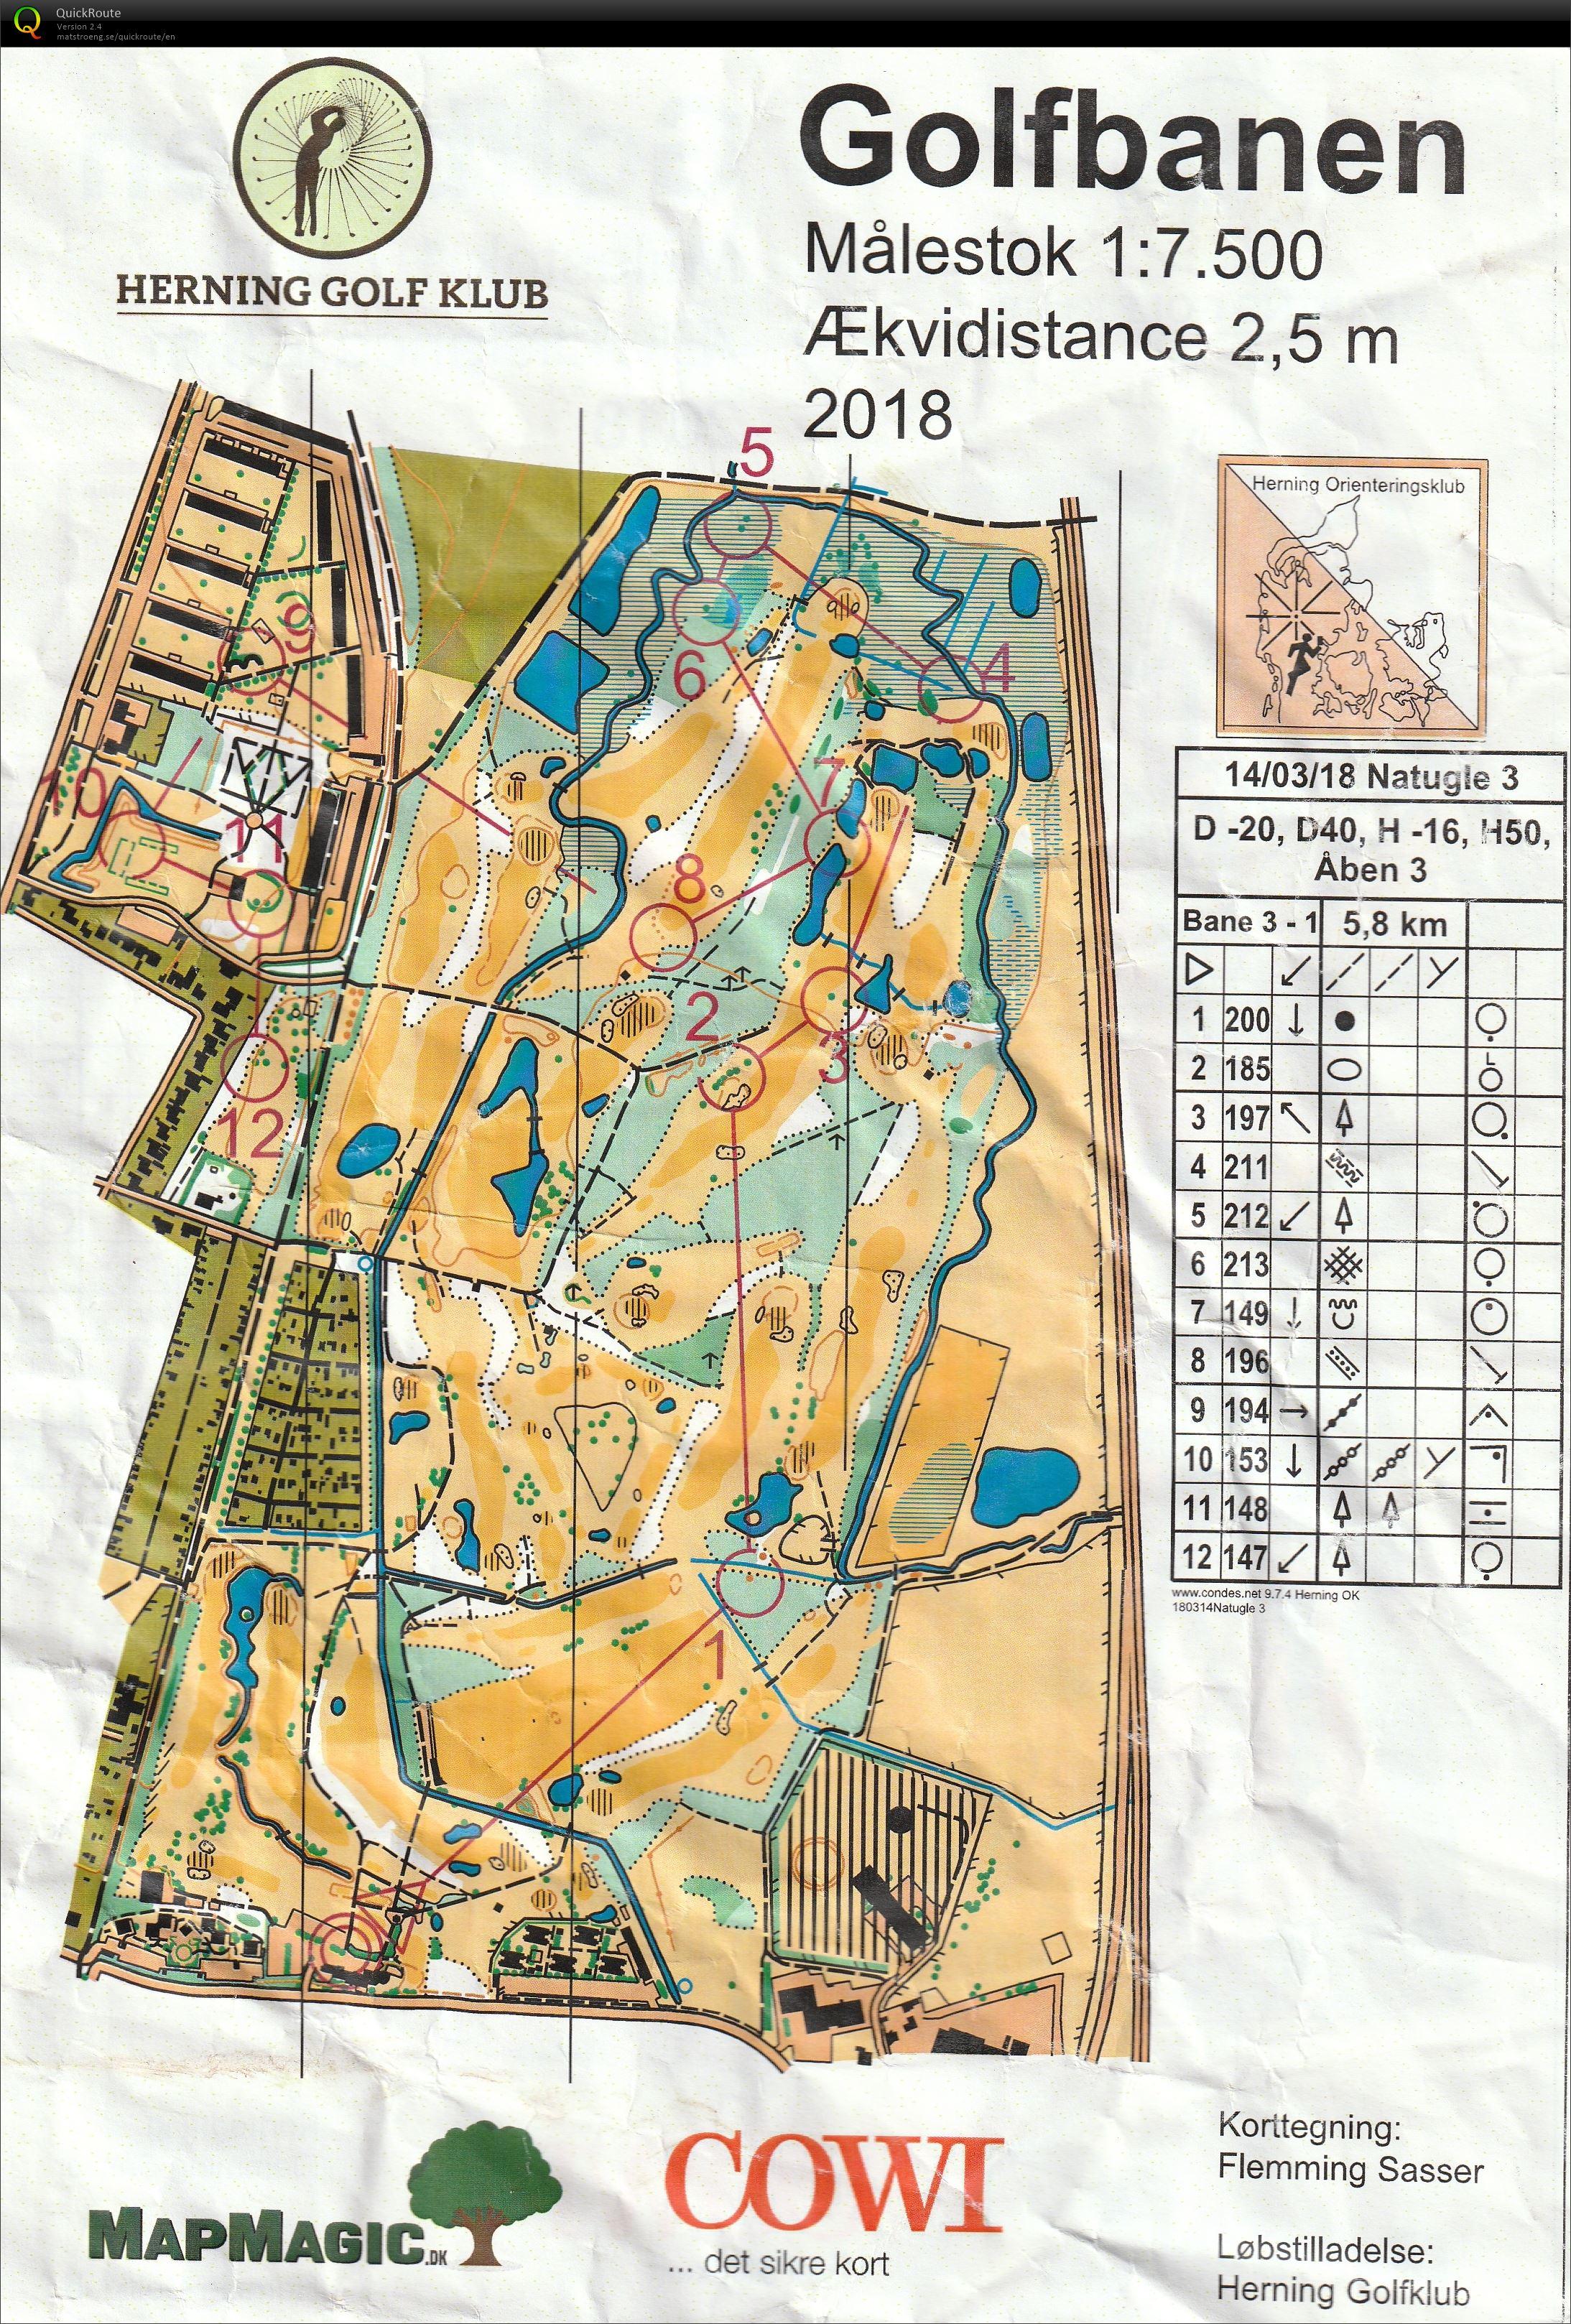 Natugle 3 Golfbanen H50 March 14th 2018 Orienteering Map